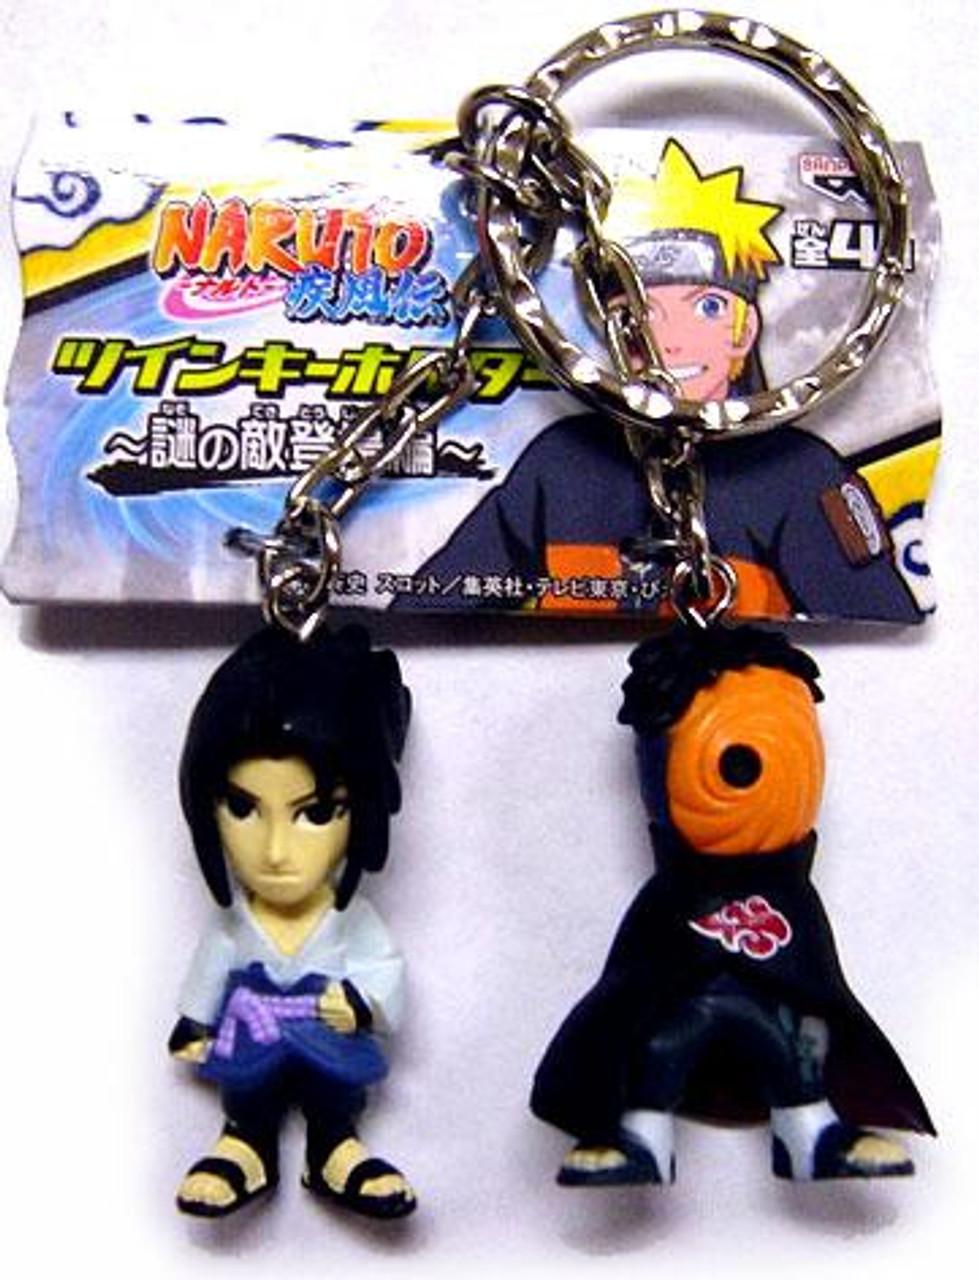 Naruto PVC Sasuke & Tobi 1.5-Inch Keychain